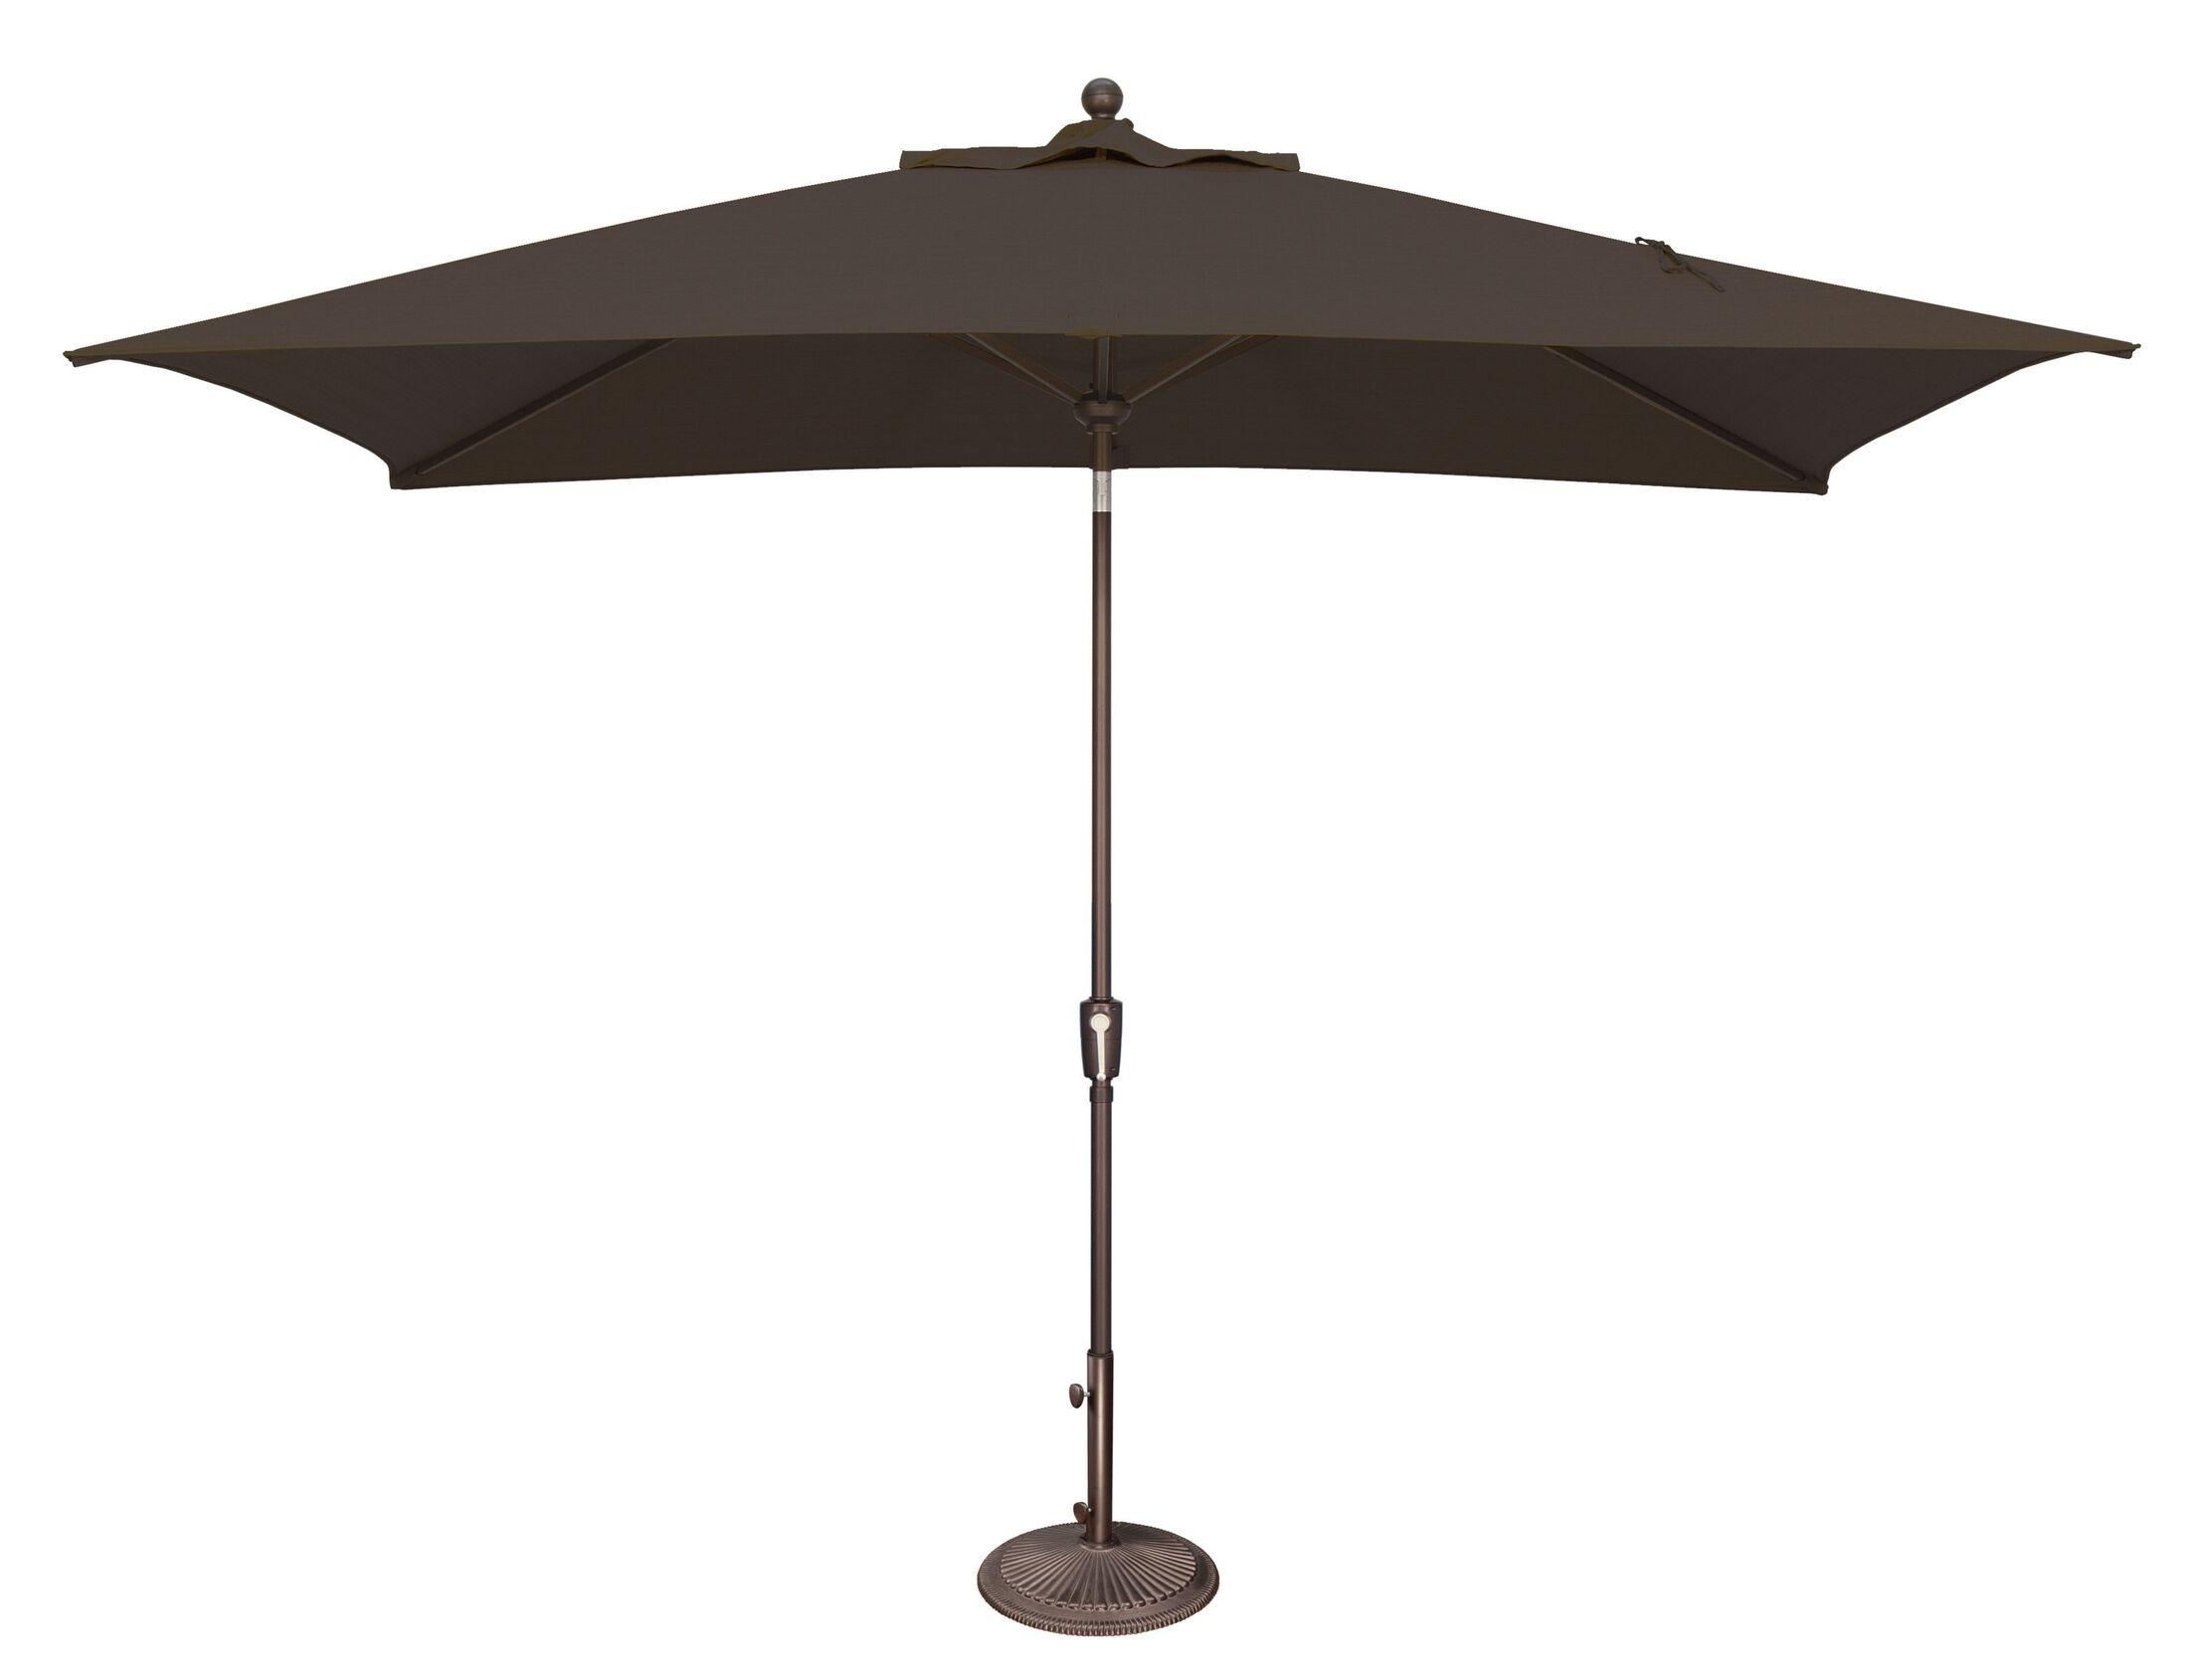 Catalina 10' X 6.5' Rectangular Market Umbrella Fabric Color: Solefin / Black